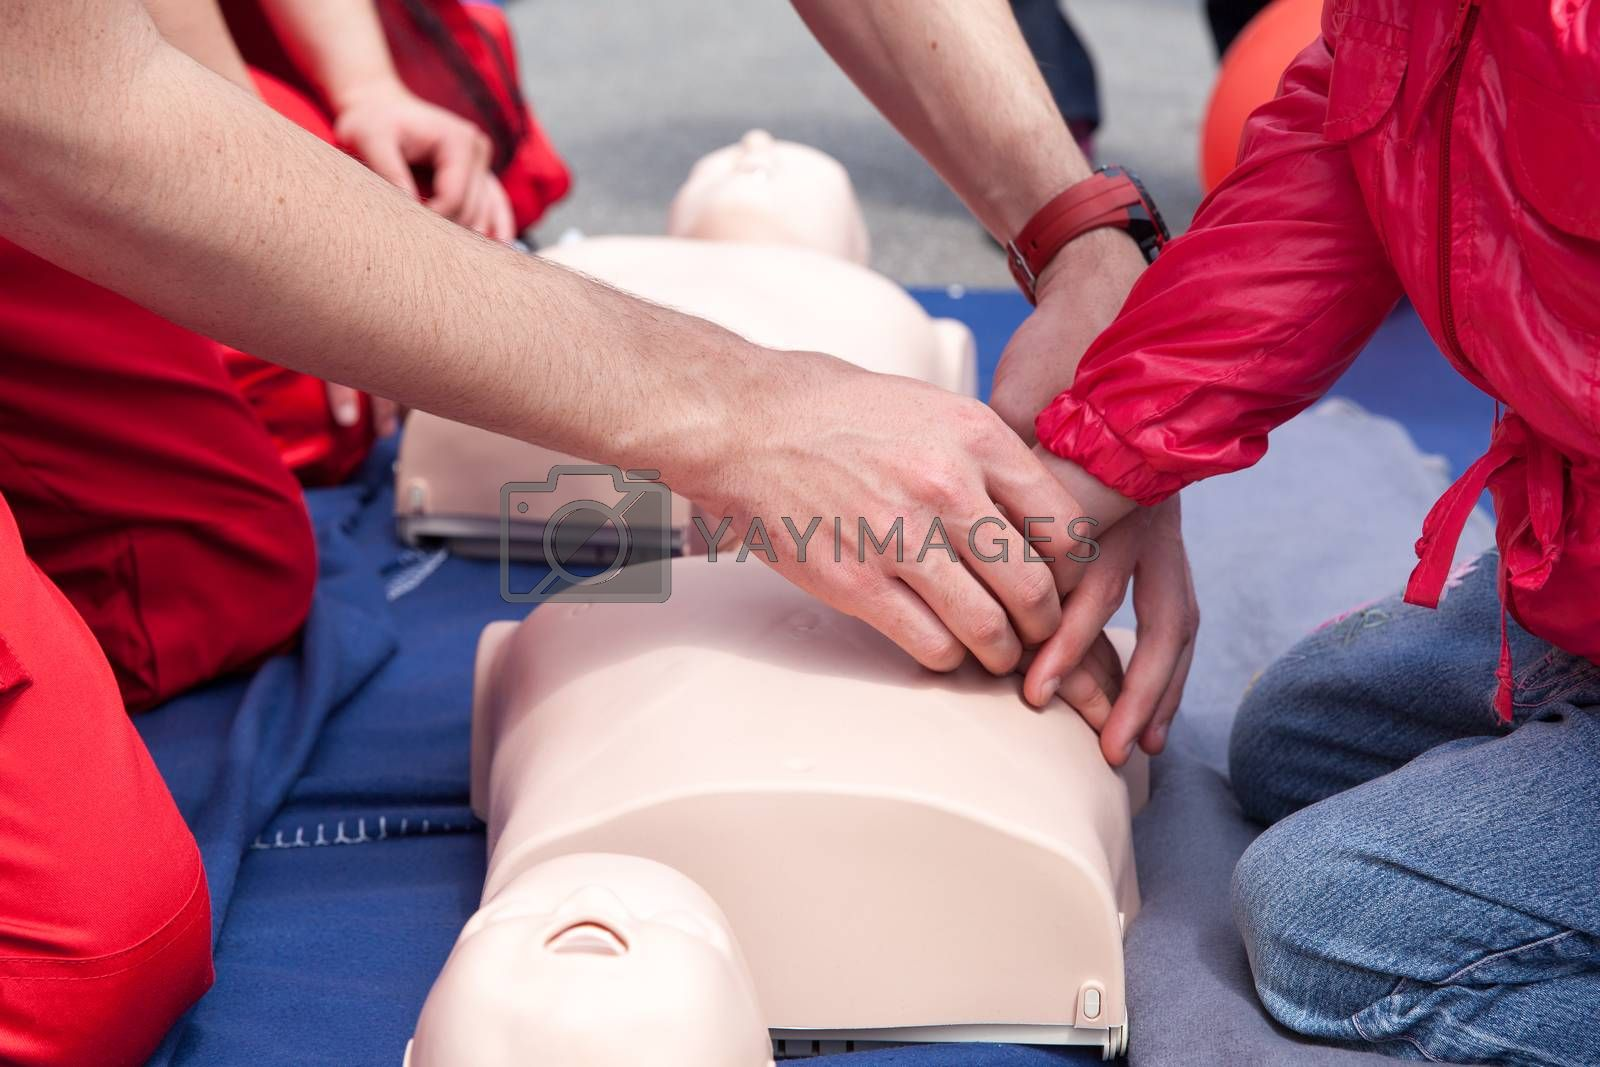 Cardiopulmonary resuscitation - CPR. Chest compression.